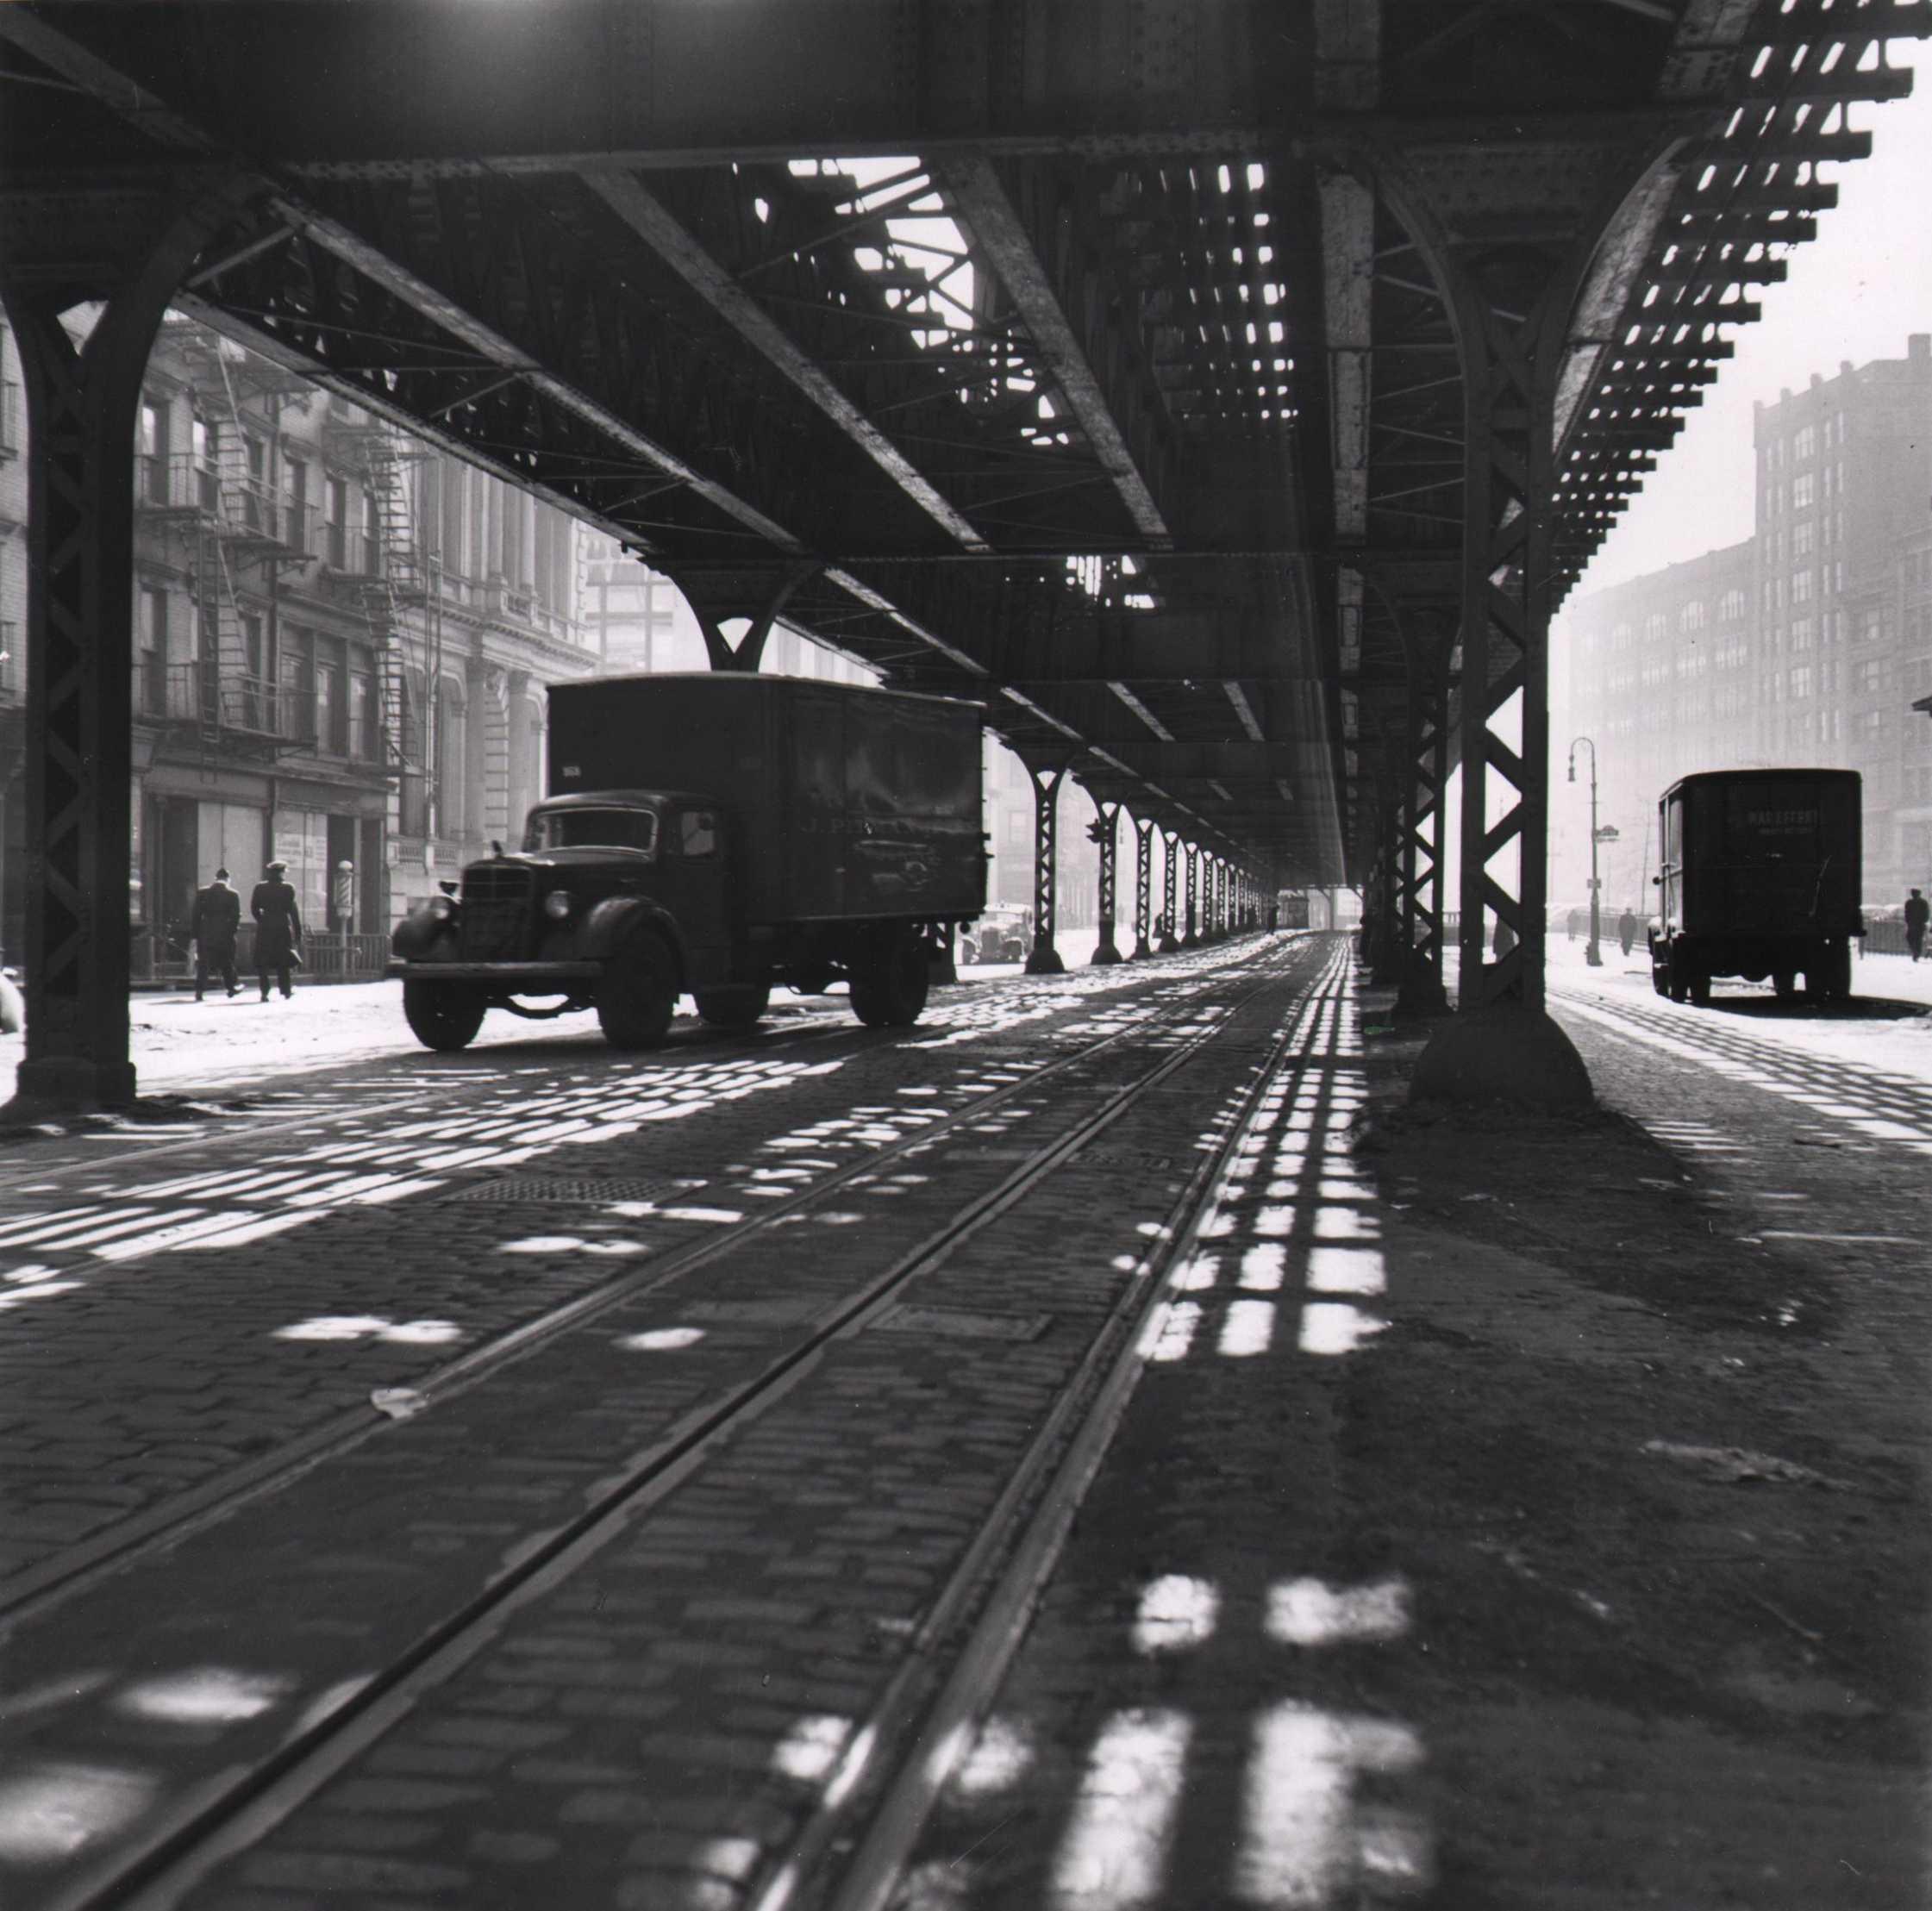 Louise Rosskam, New York City- Trucking. Trucks under the Third Avenue elevated platform, 1945